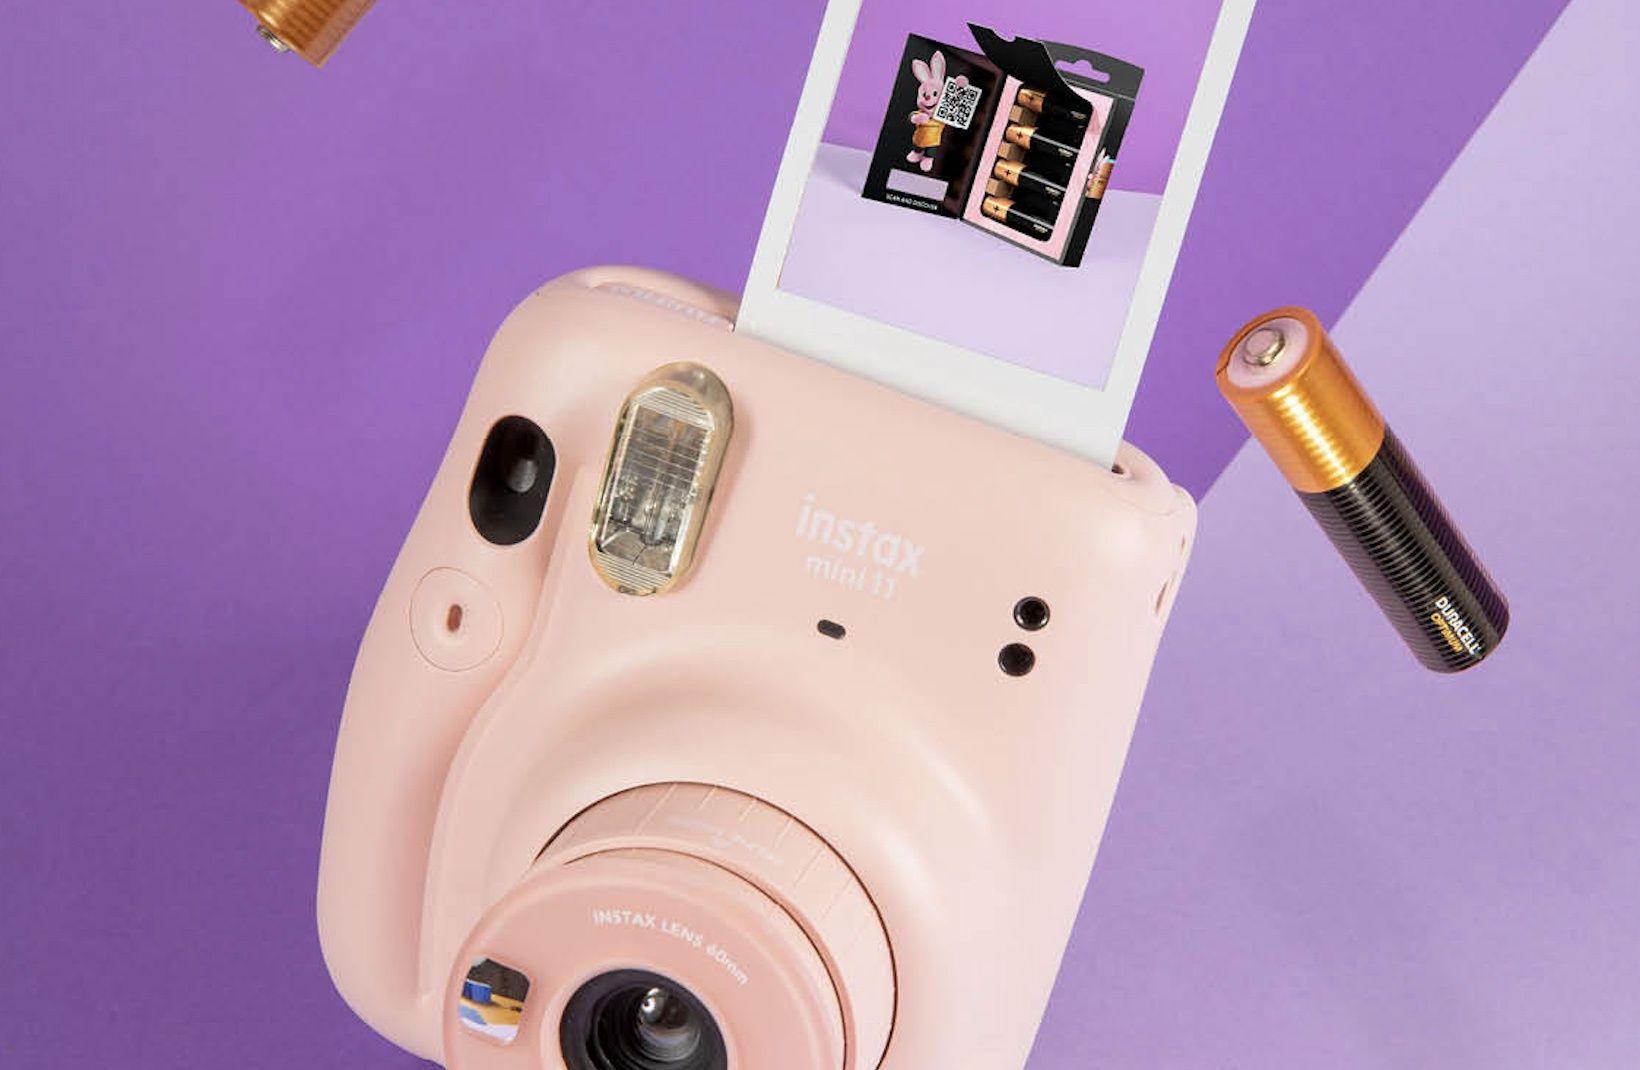 Selon Duracell, la pile Optimum permet de prendre 200 photo de plus avec l'Instax Mini 11 de Fujifilm.